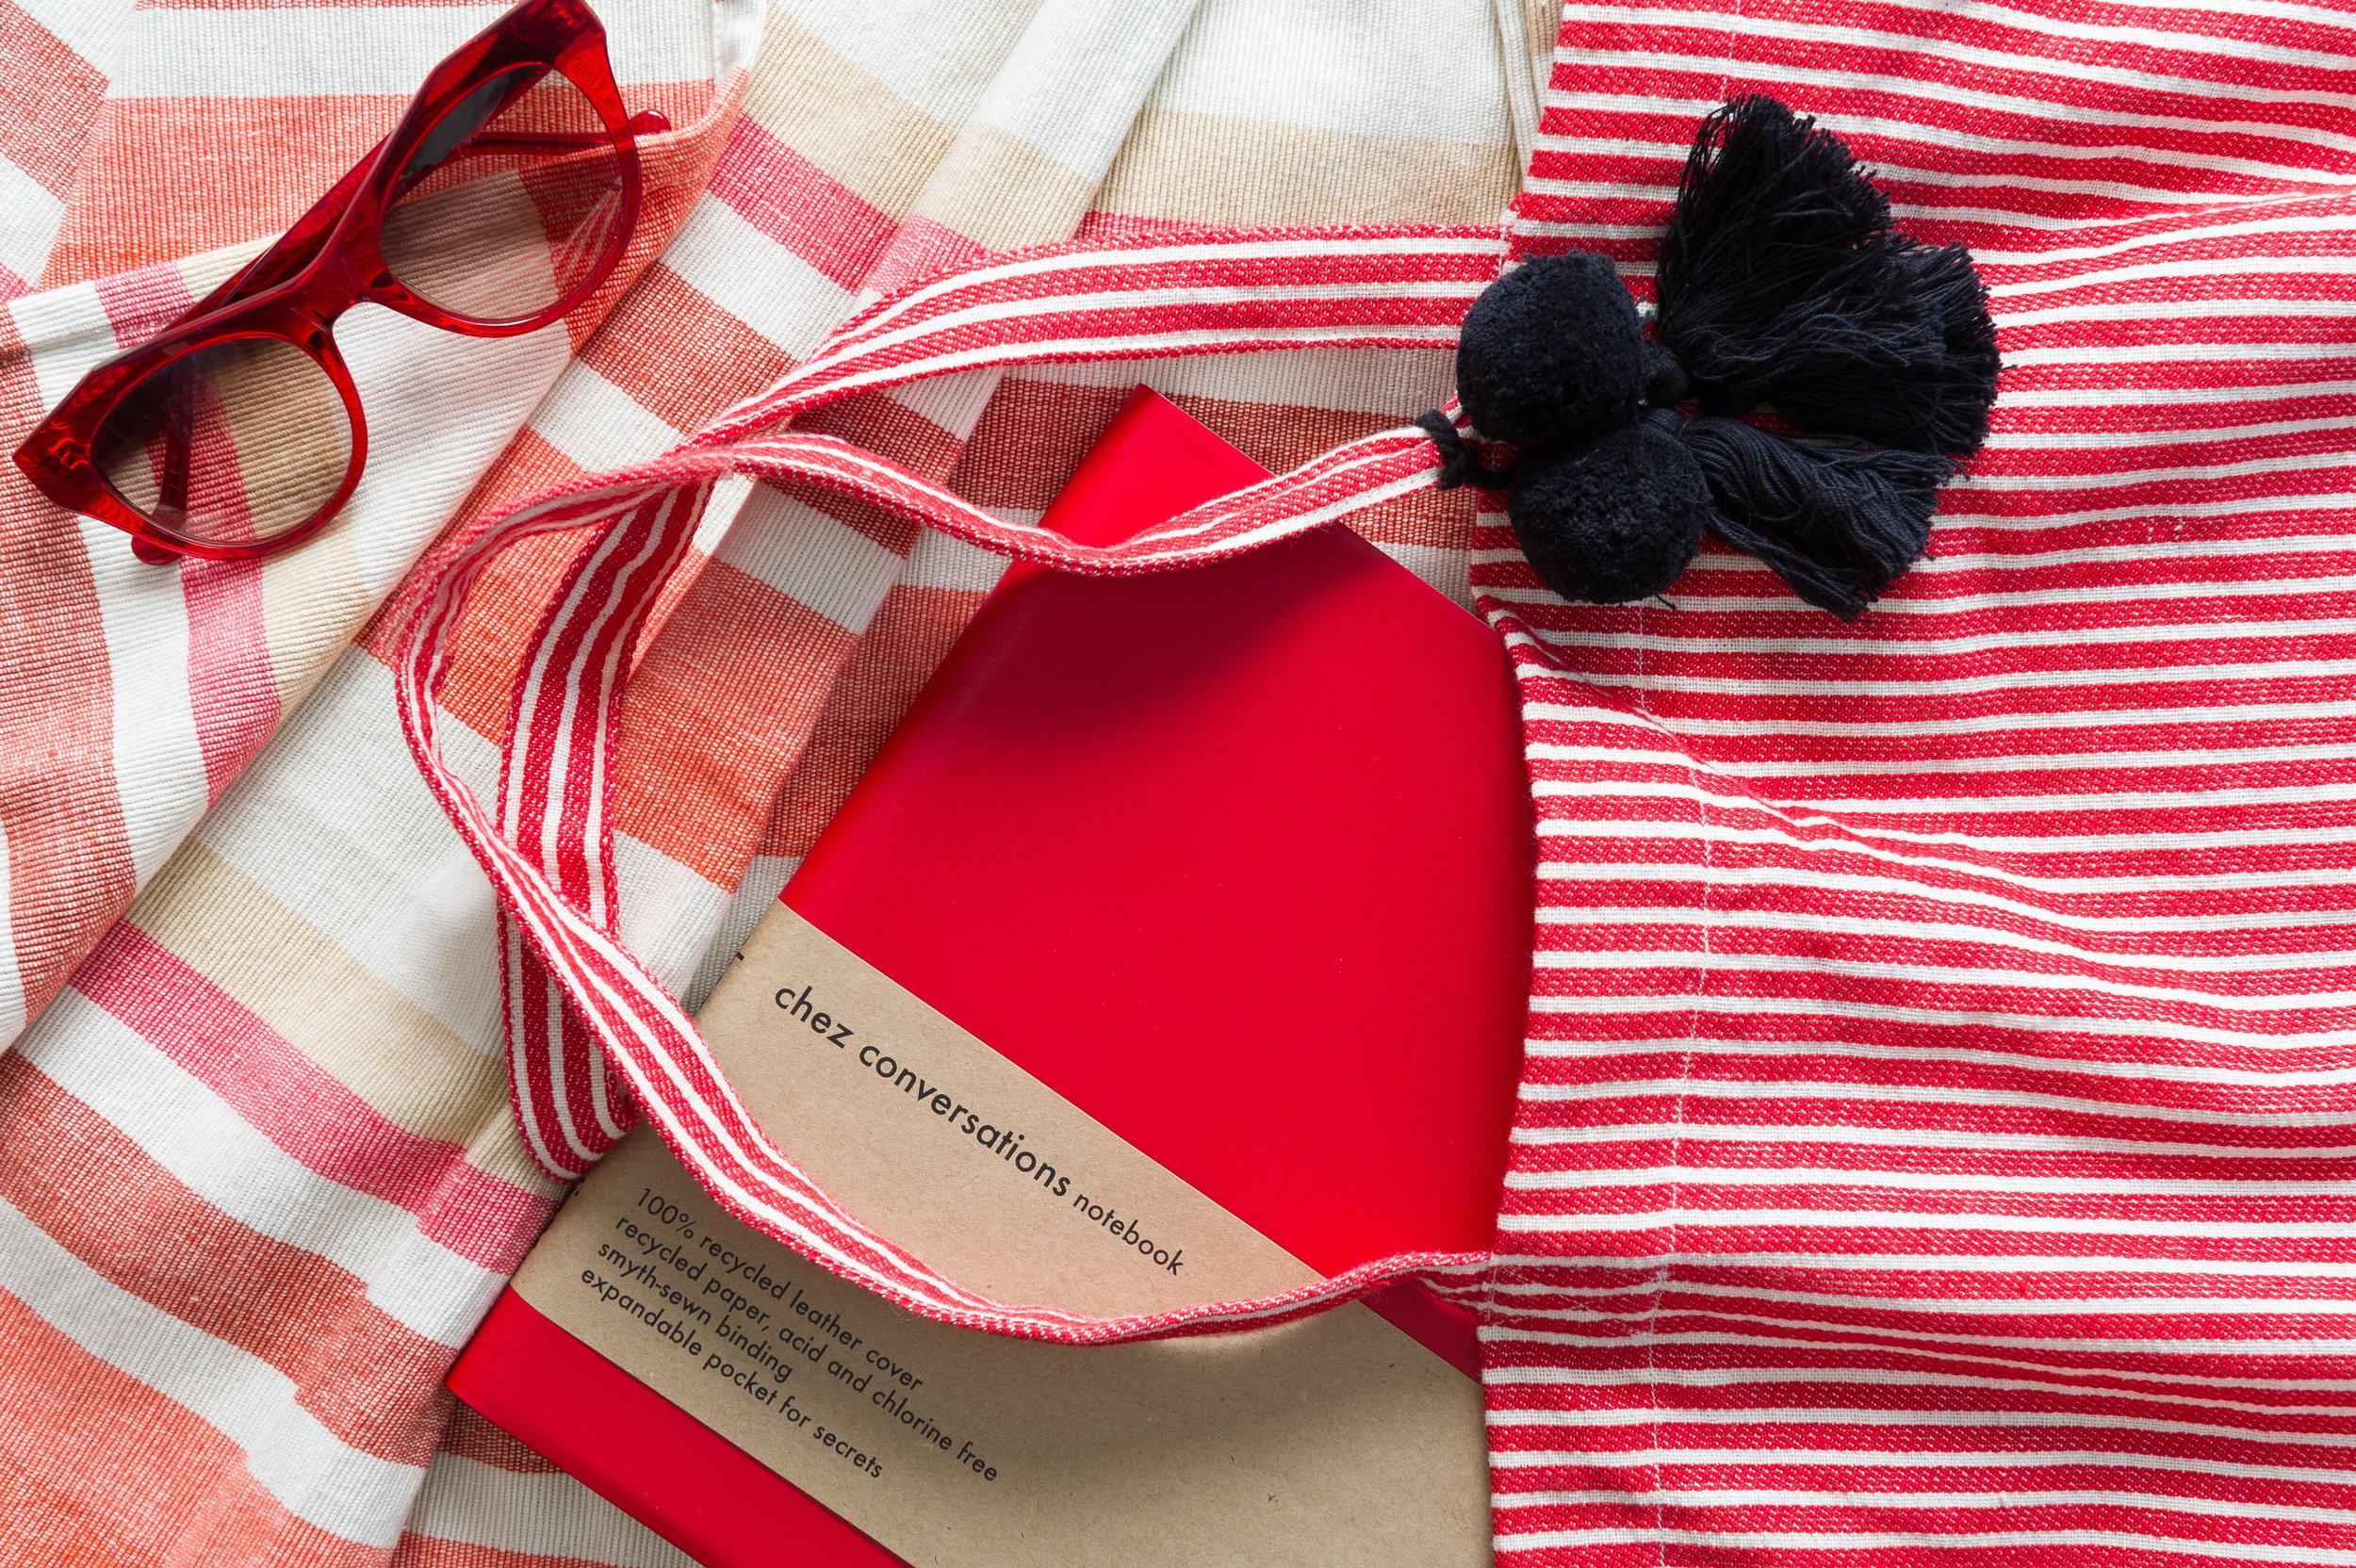 Cordelia Tote Bag in blush combo and the Sunrise Beach Blanket.